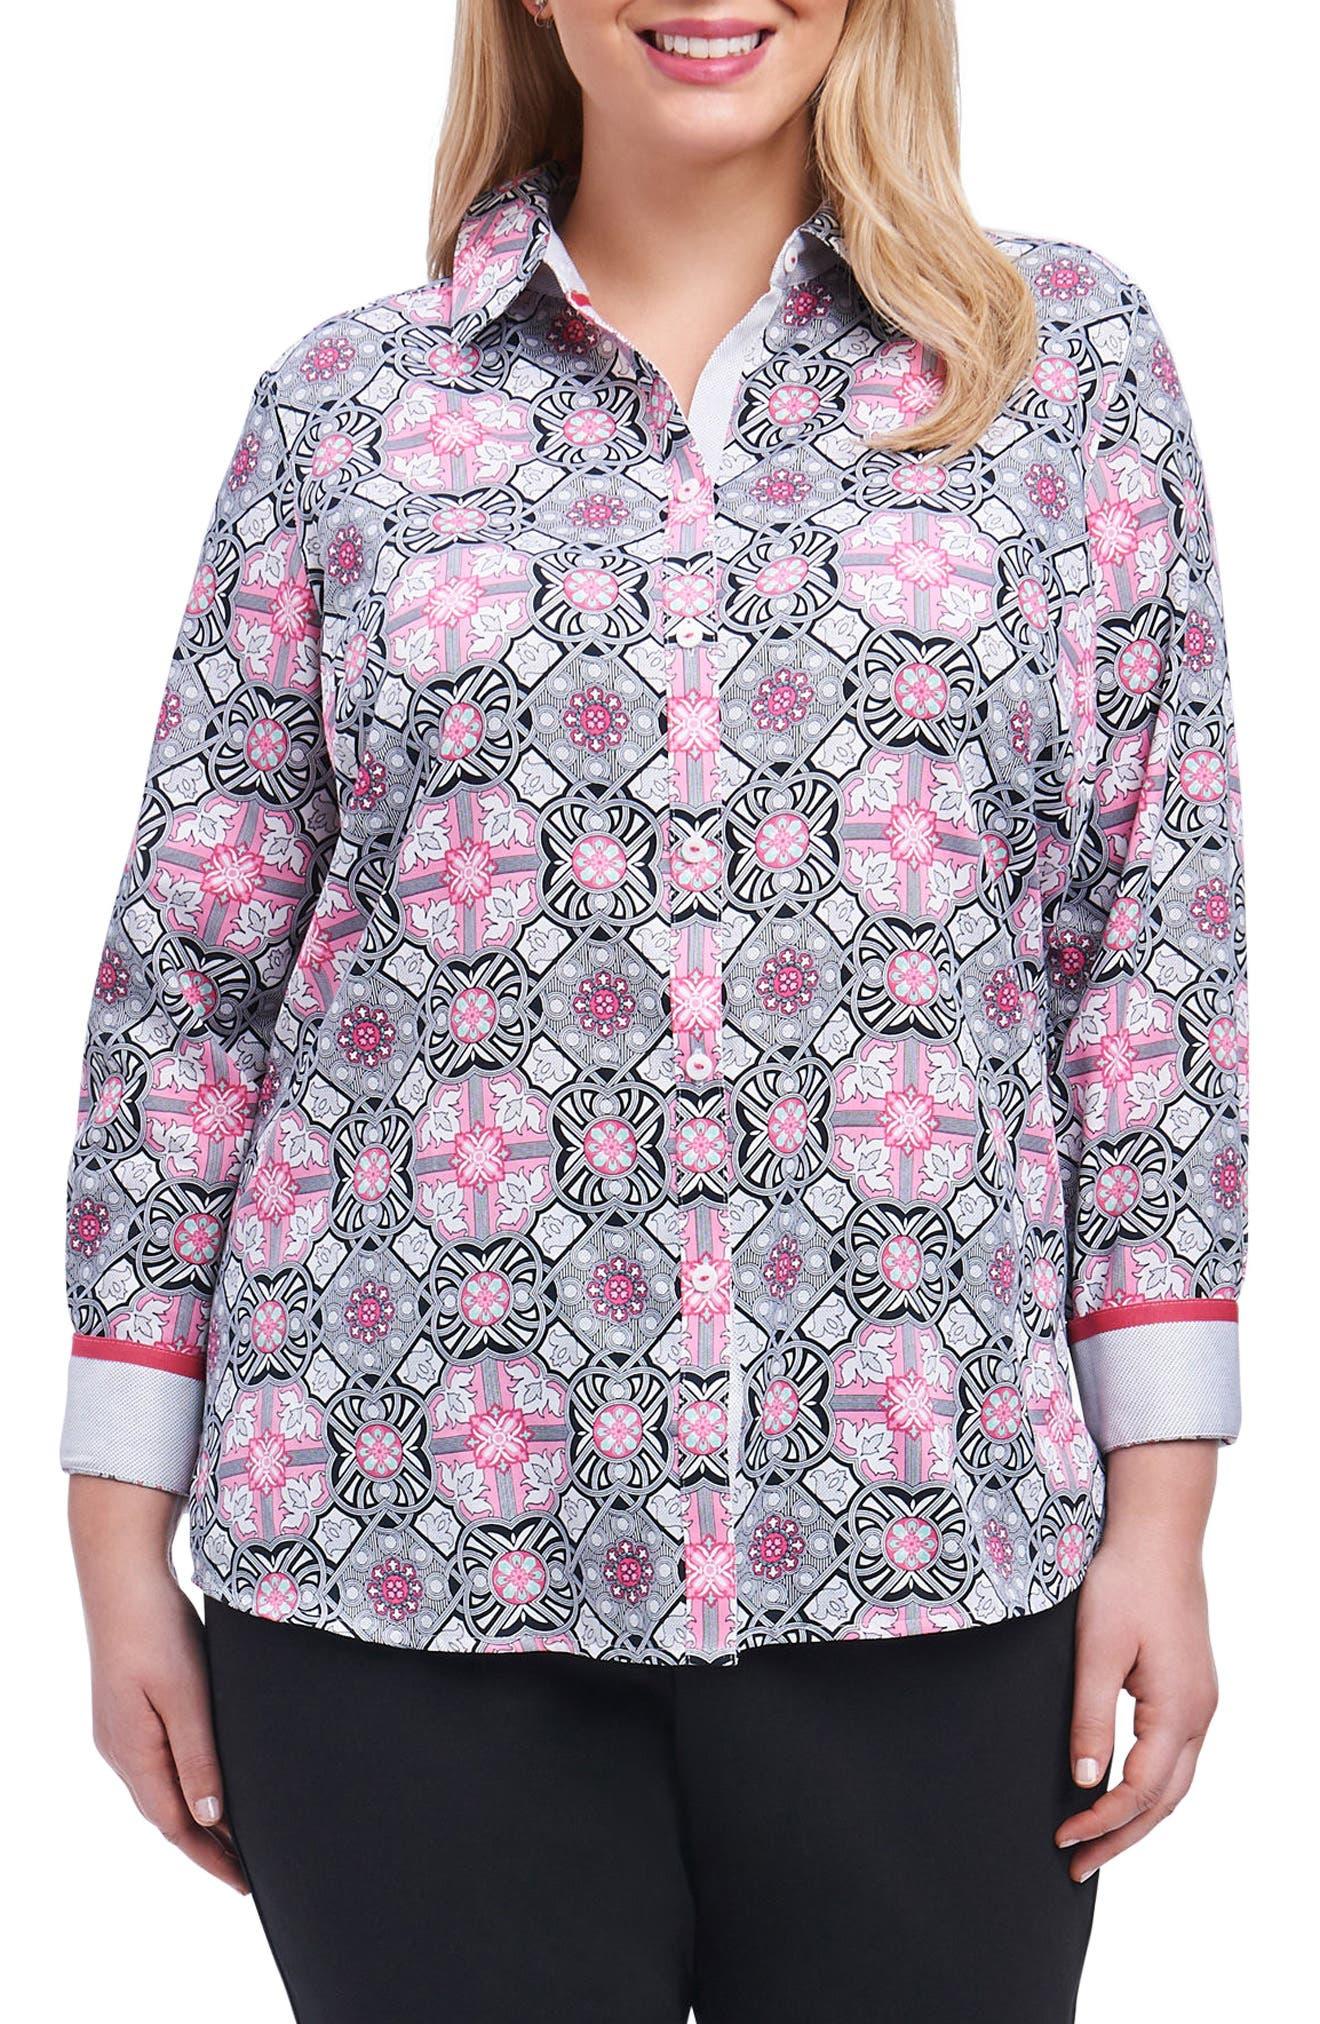 Ava Mosaic Tile Shirt,                             Main thumbnail 1, color,                             Multi